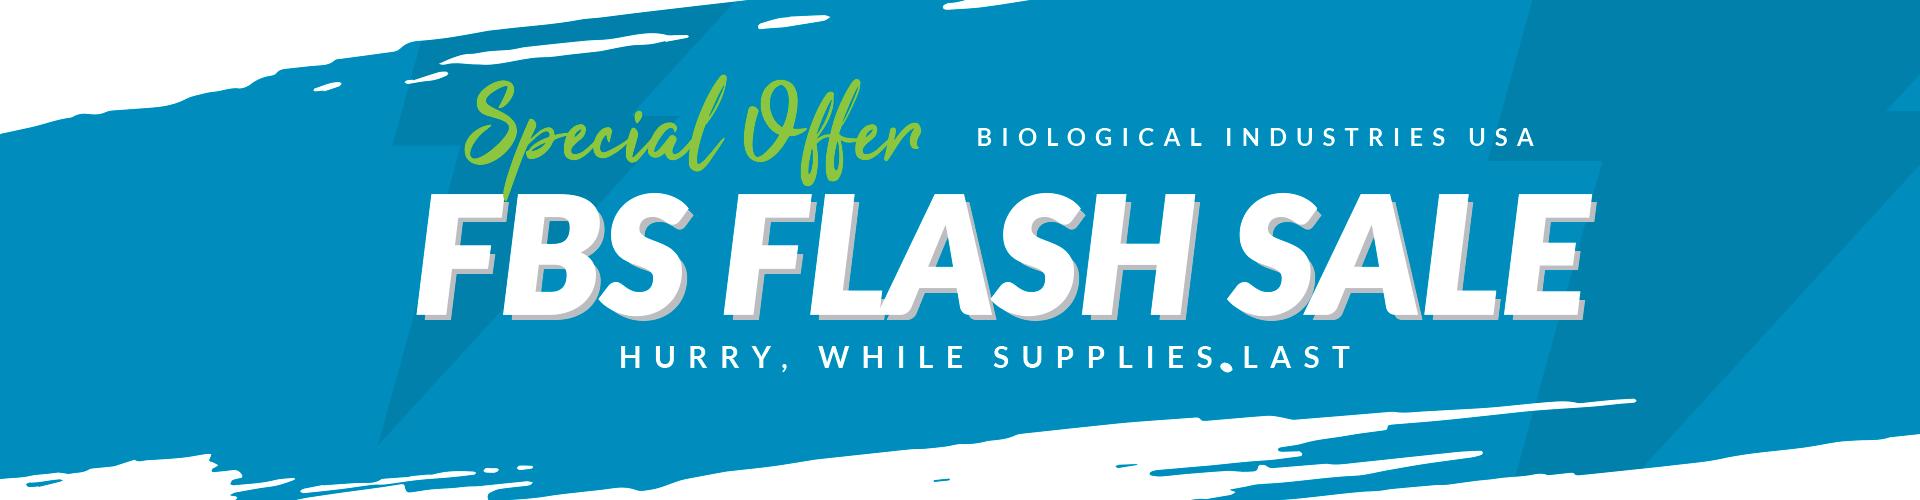 FBS Flash Sale